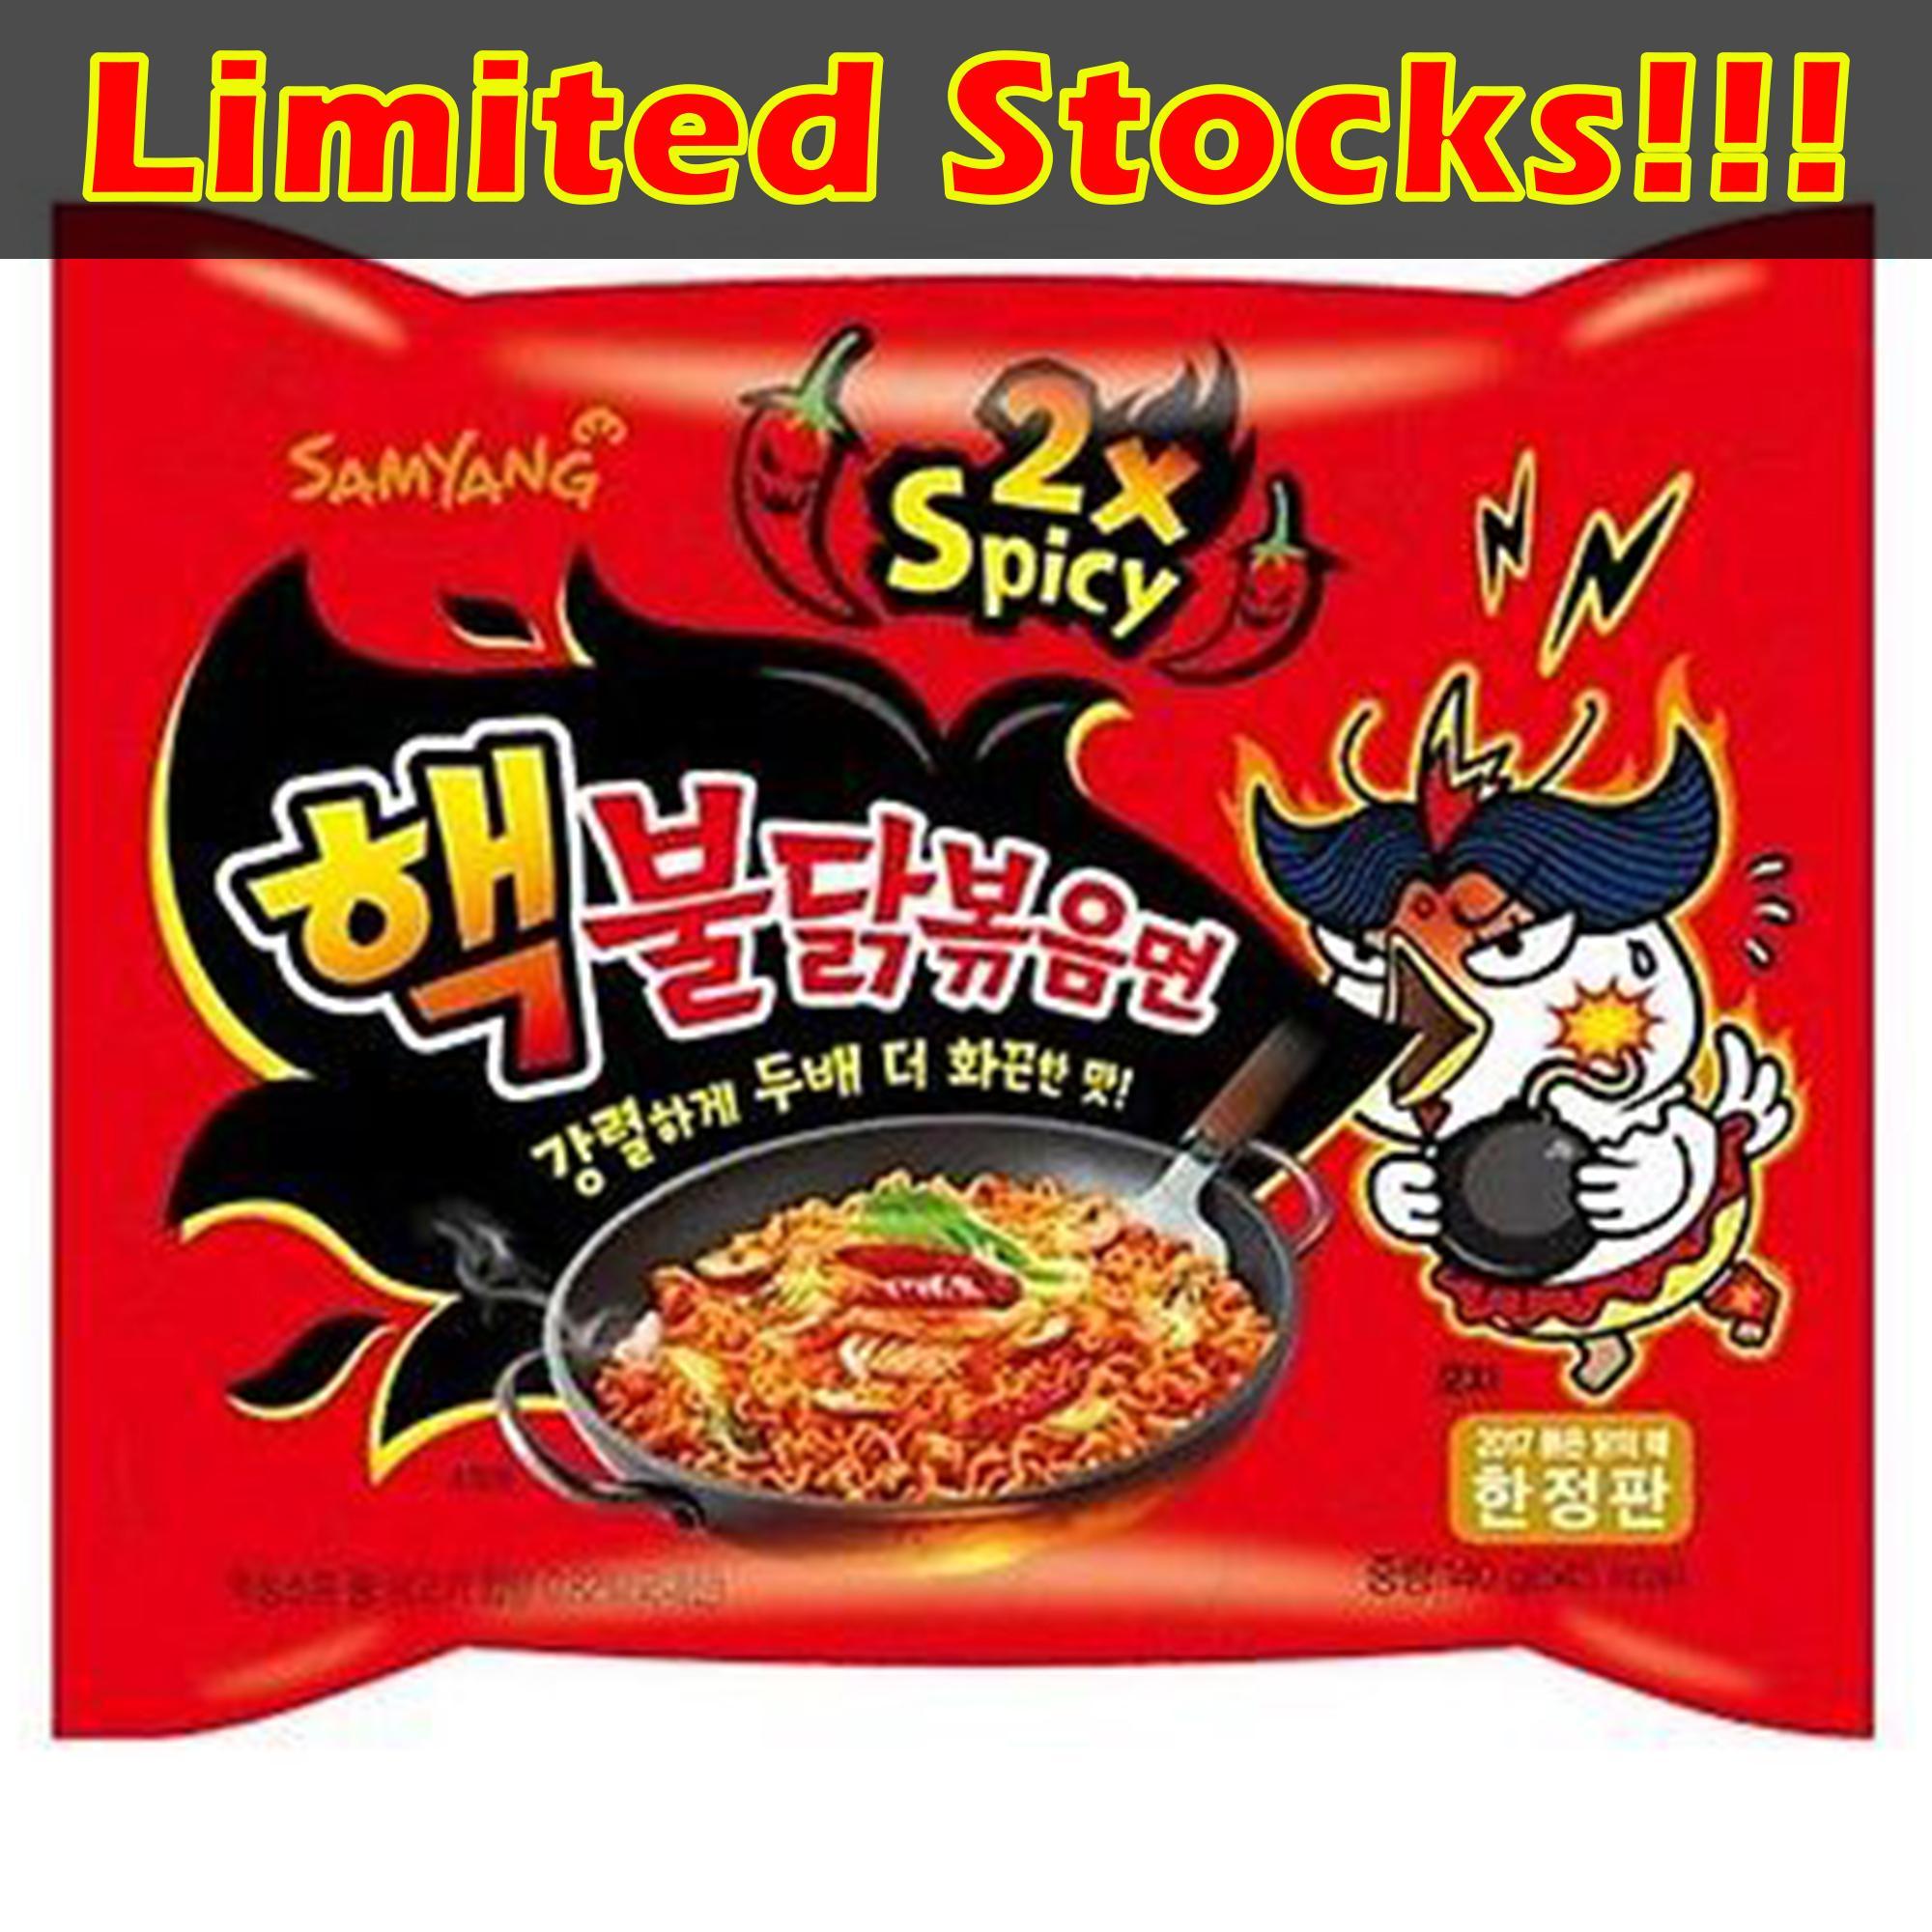 Dry Foods Brands Packaged On Sale Prices Set Reviews In Paldo Bowl Noodle Shrimp Flavor 86 Gram 5pc Samyang Buldak Spicy Fire Chicken Multi